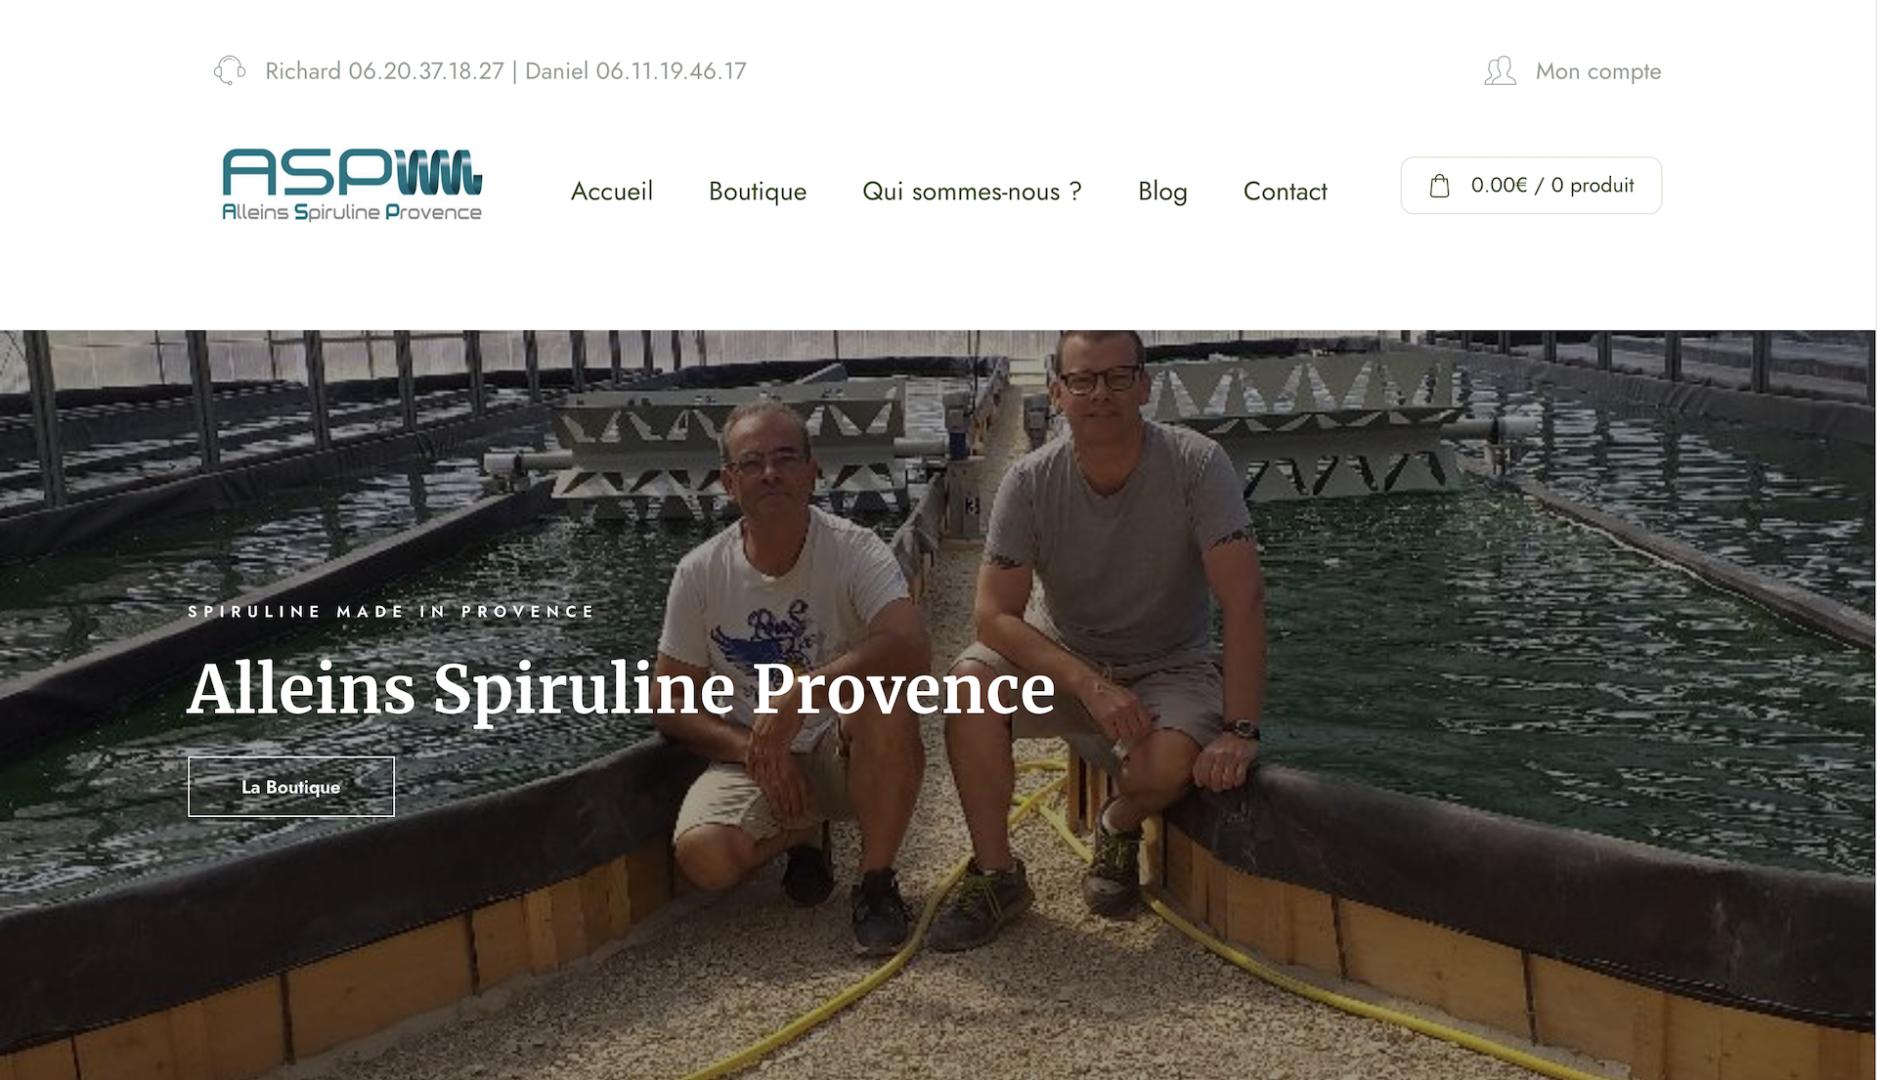 Alleins Spiruline - Producteur Spiruline Provence - Geoffrey Leduc Création site internet